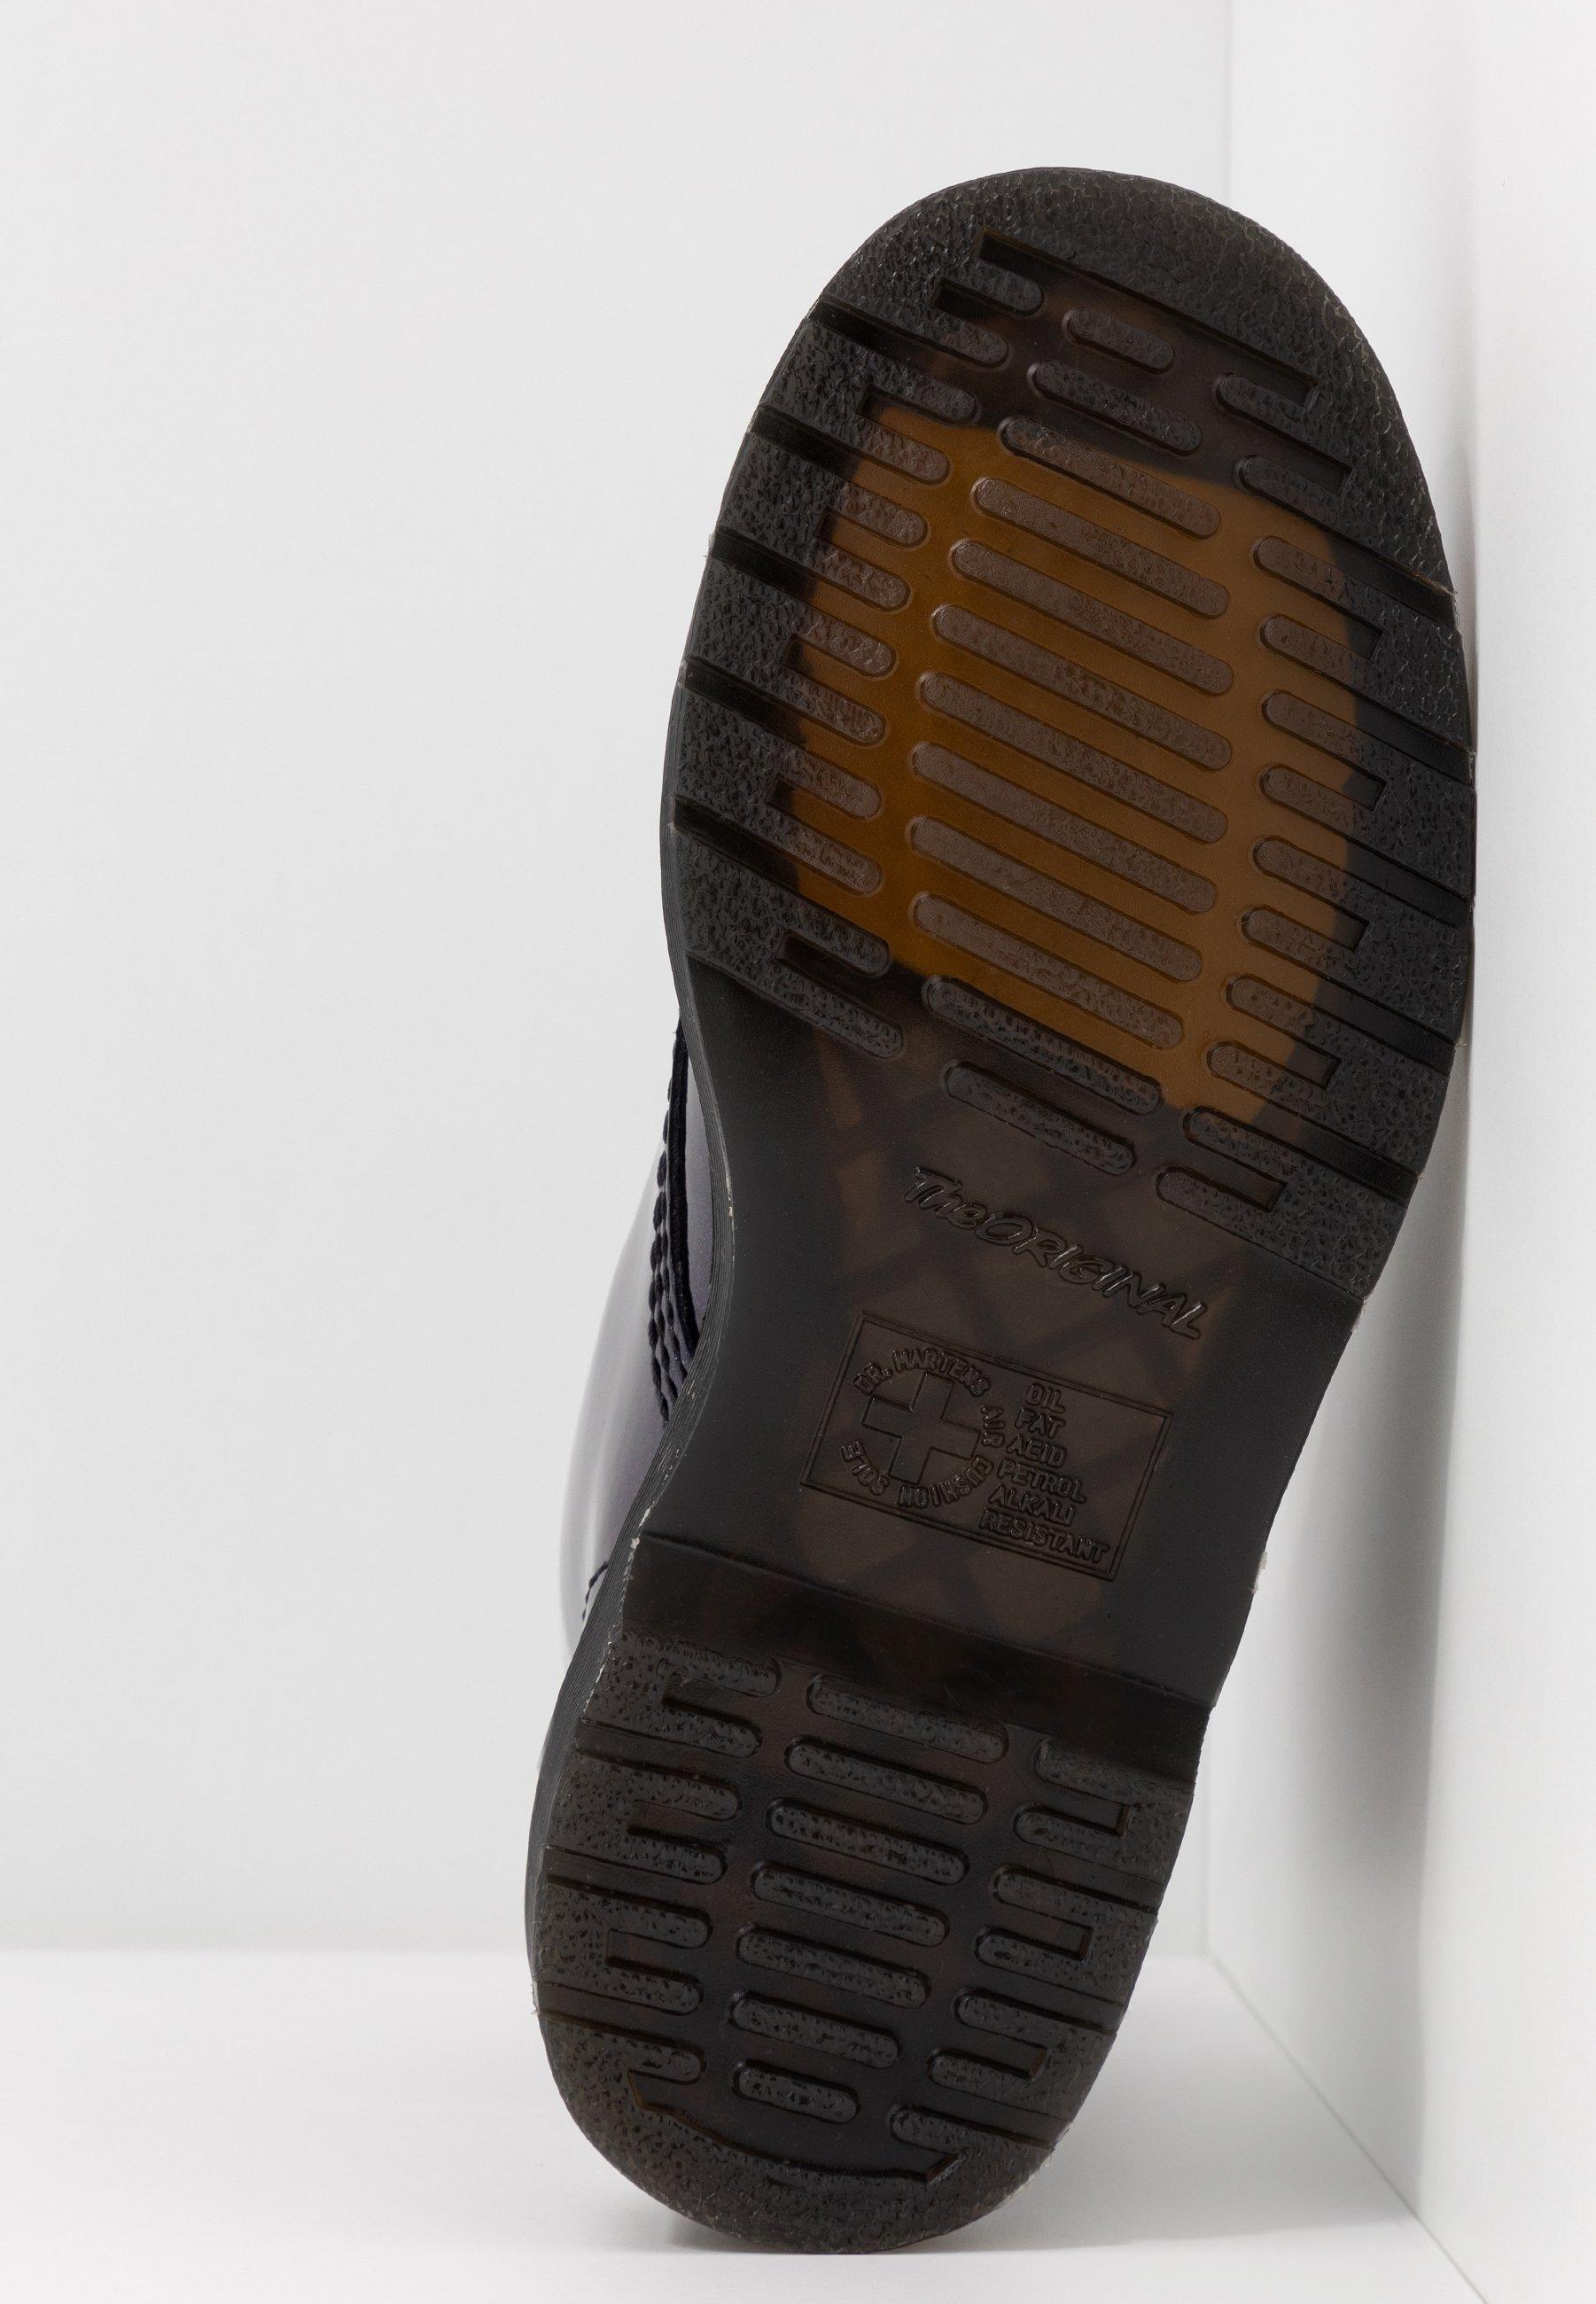 Dr. Martens 1460 8 Eye Boot - Snörstövletter Teal/pacific Sparkle